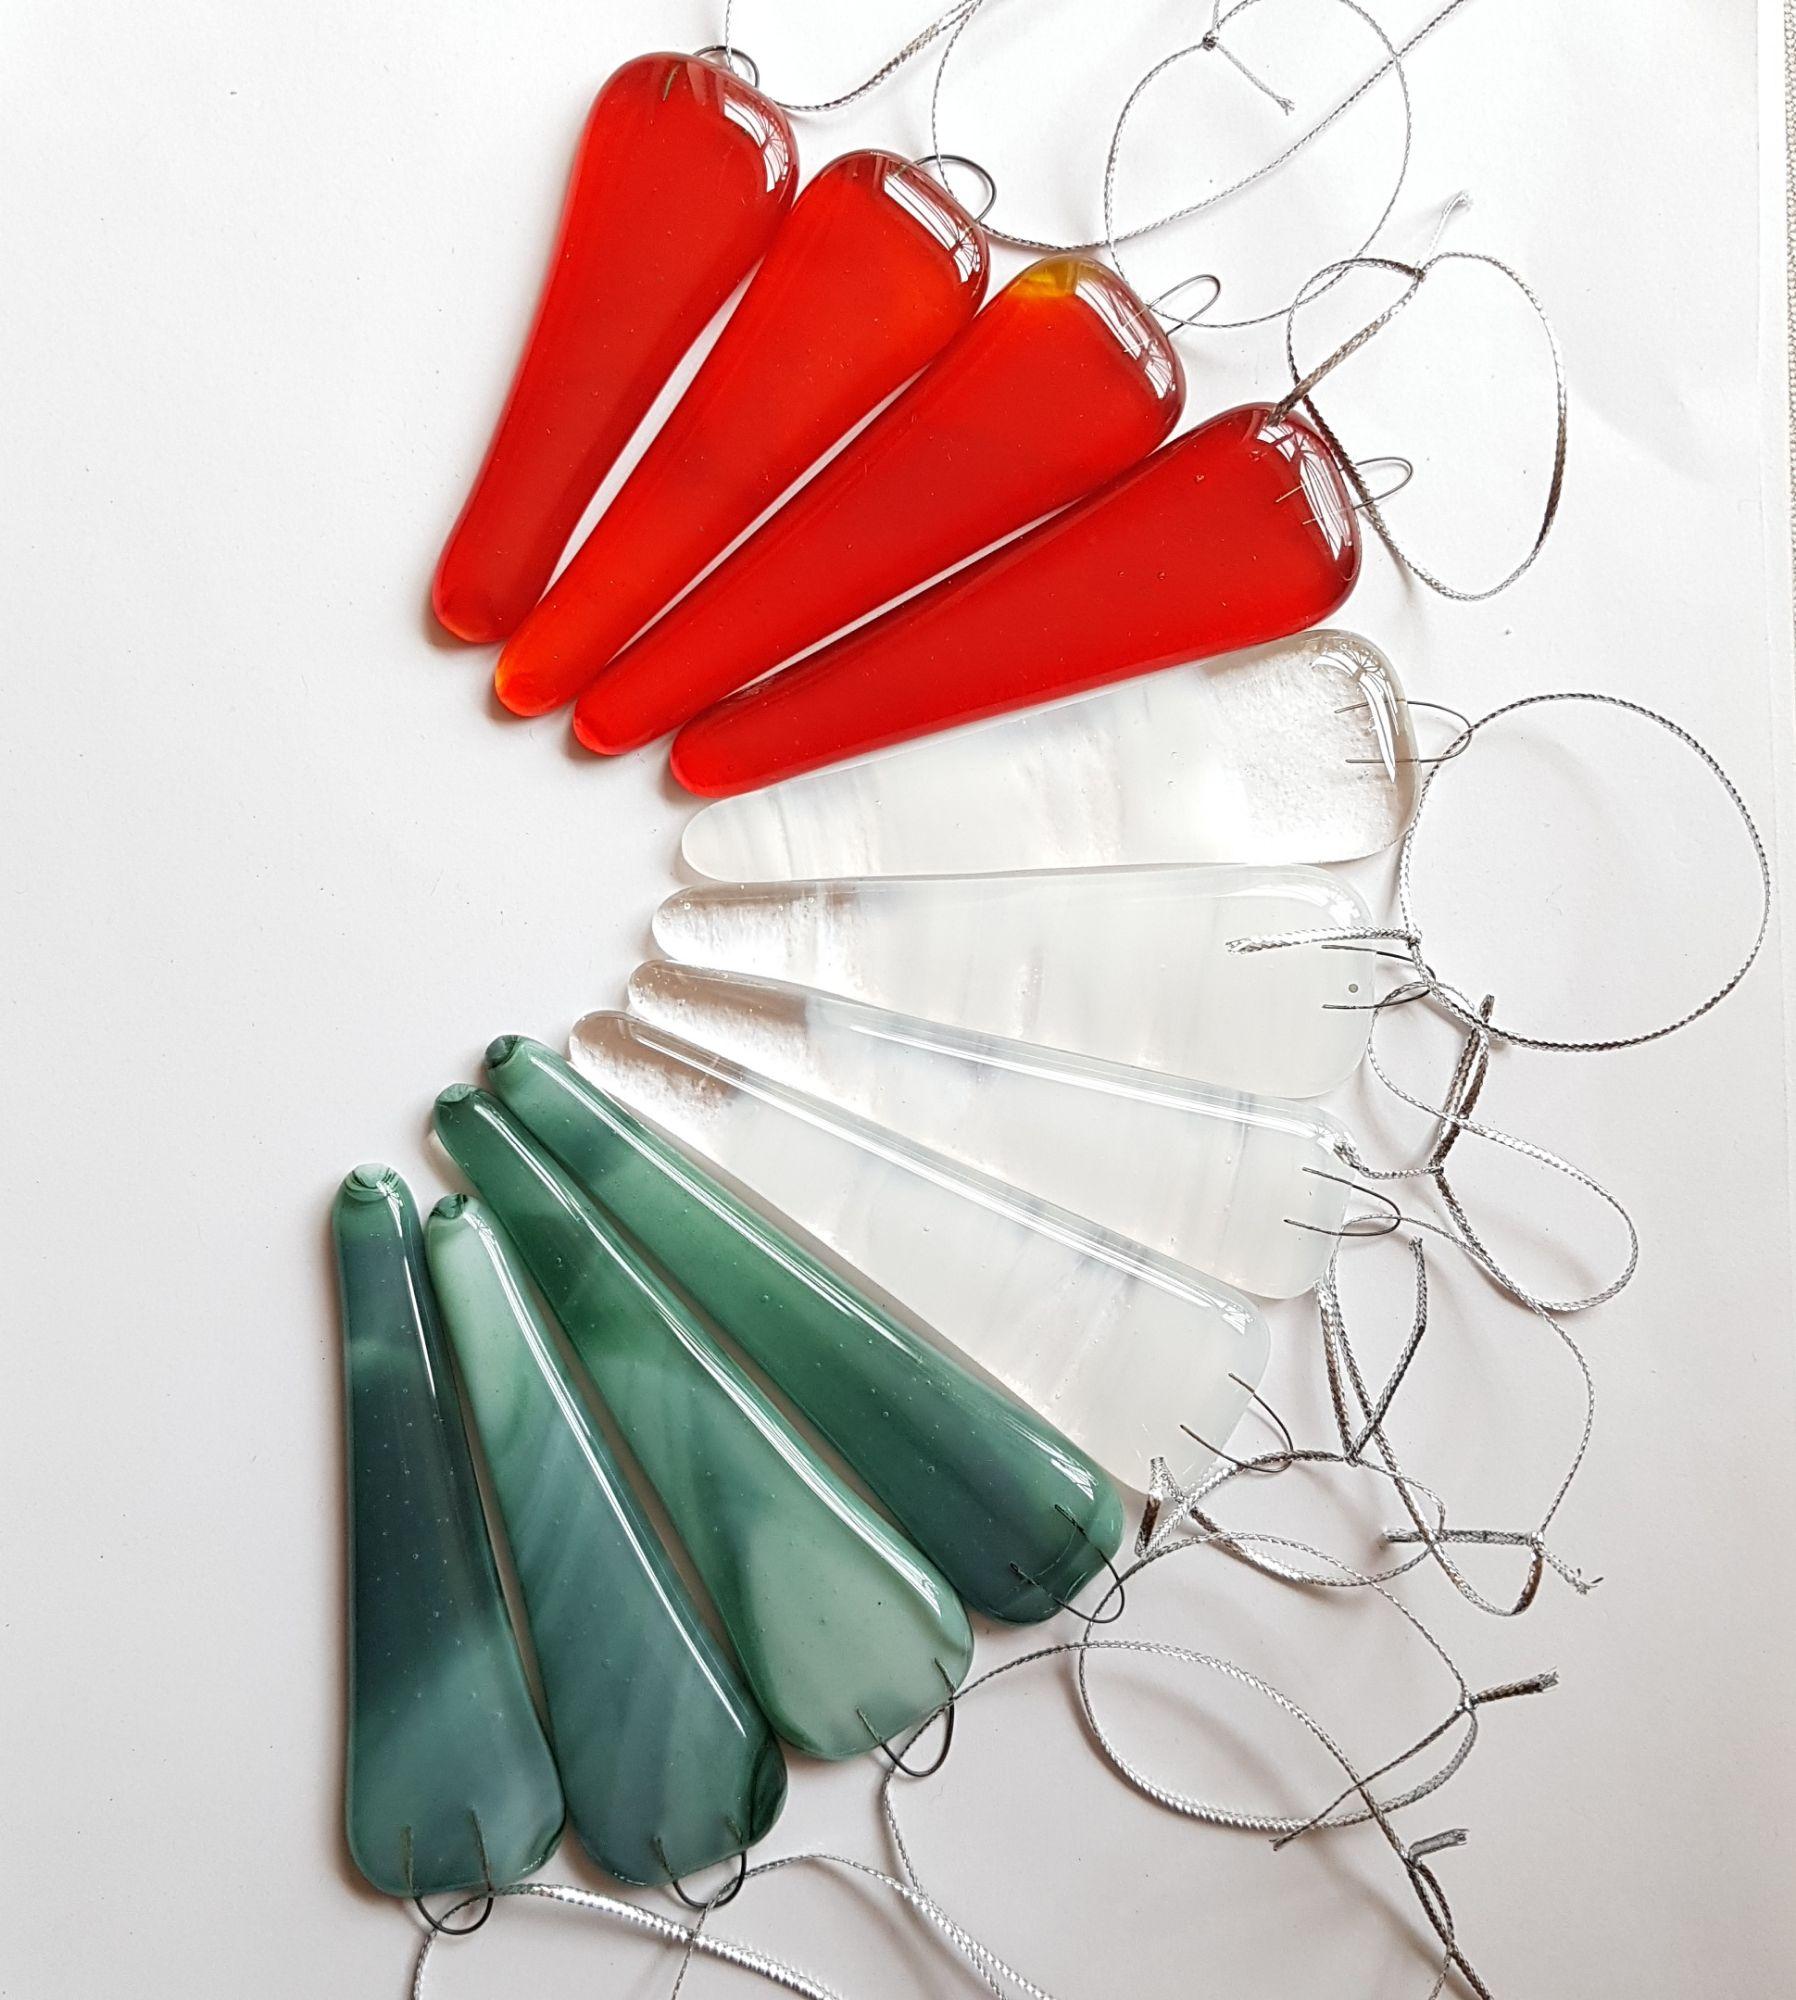 Christmas tree glass decorations